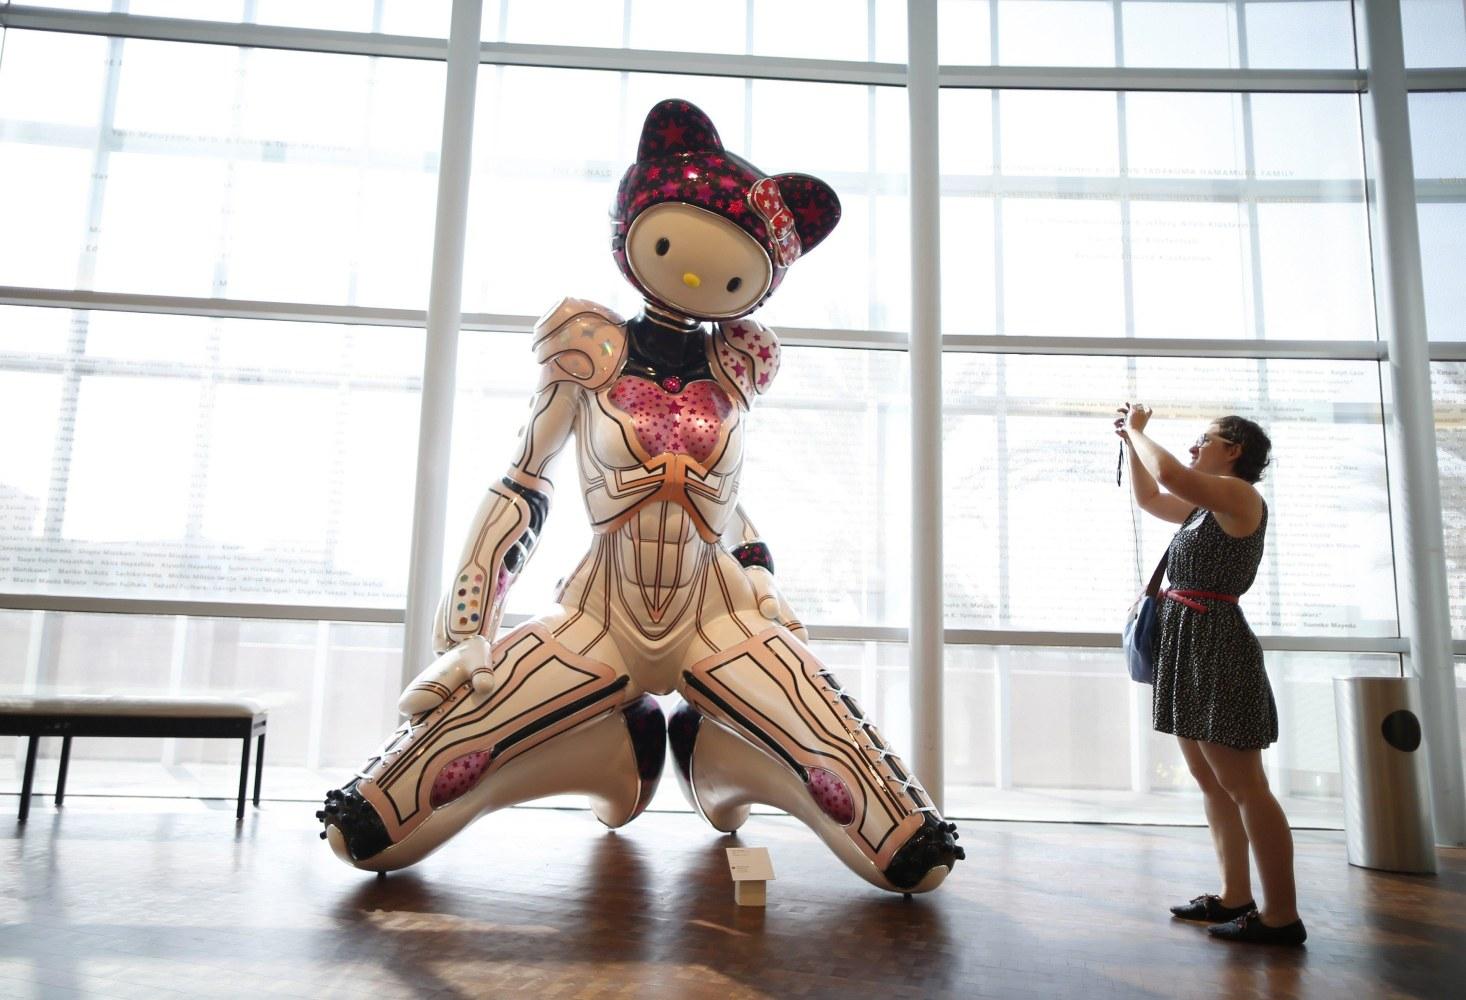 Supercute Cartoon Icon Hello Kitty Celebrates Th Birthday - Christian museums in the usa